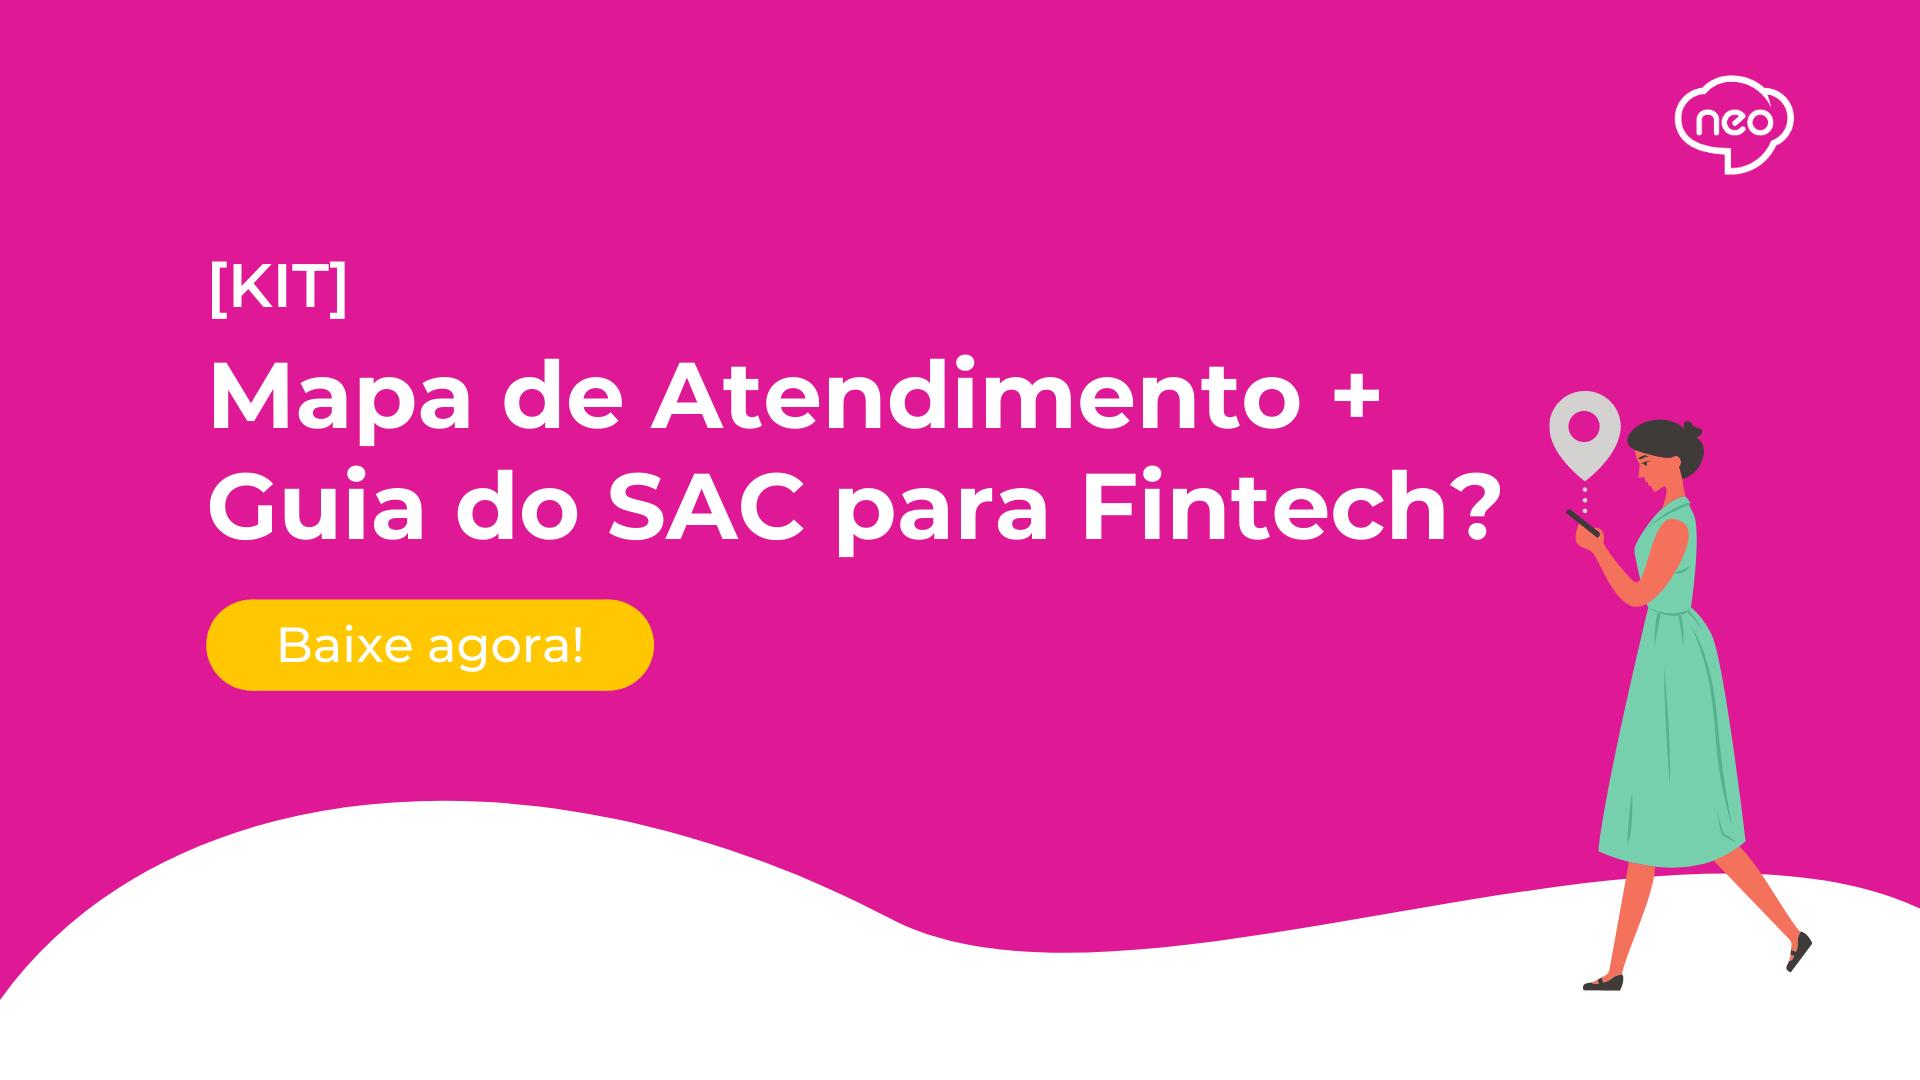 Mapa do Atendimento + Guia do SAC para Fintech